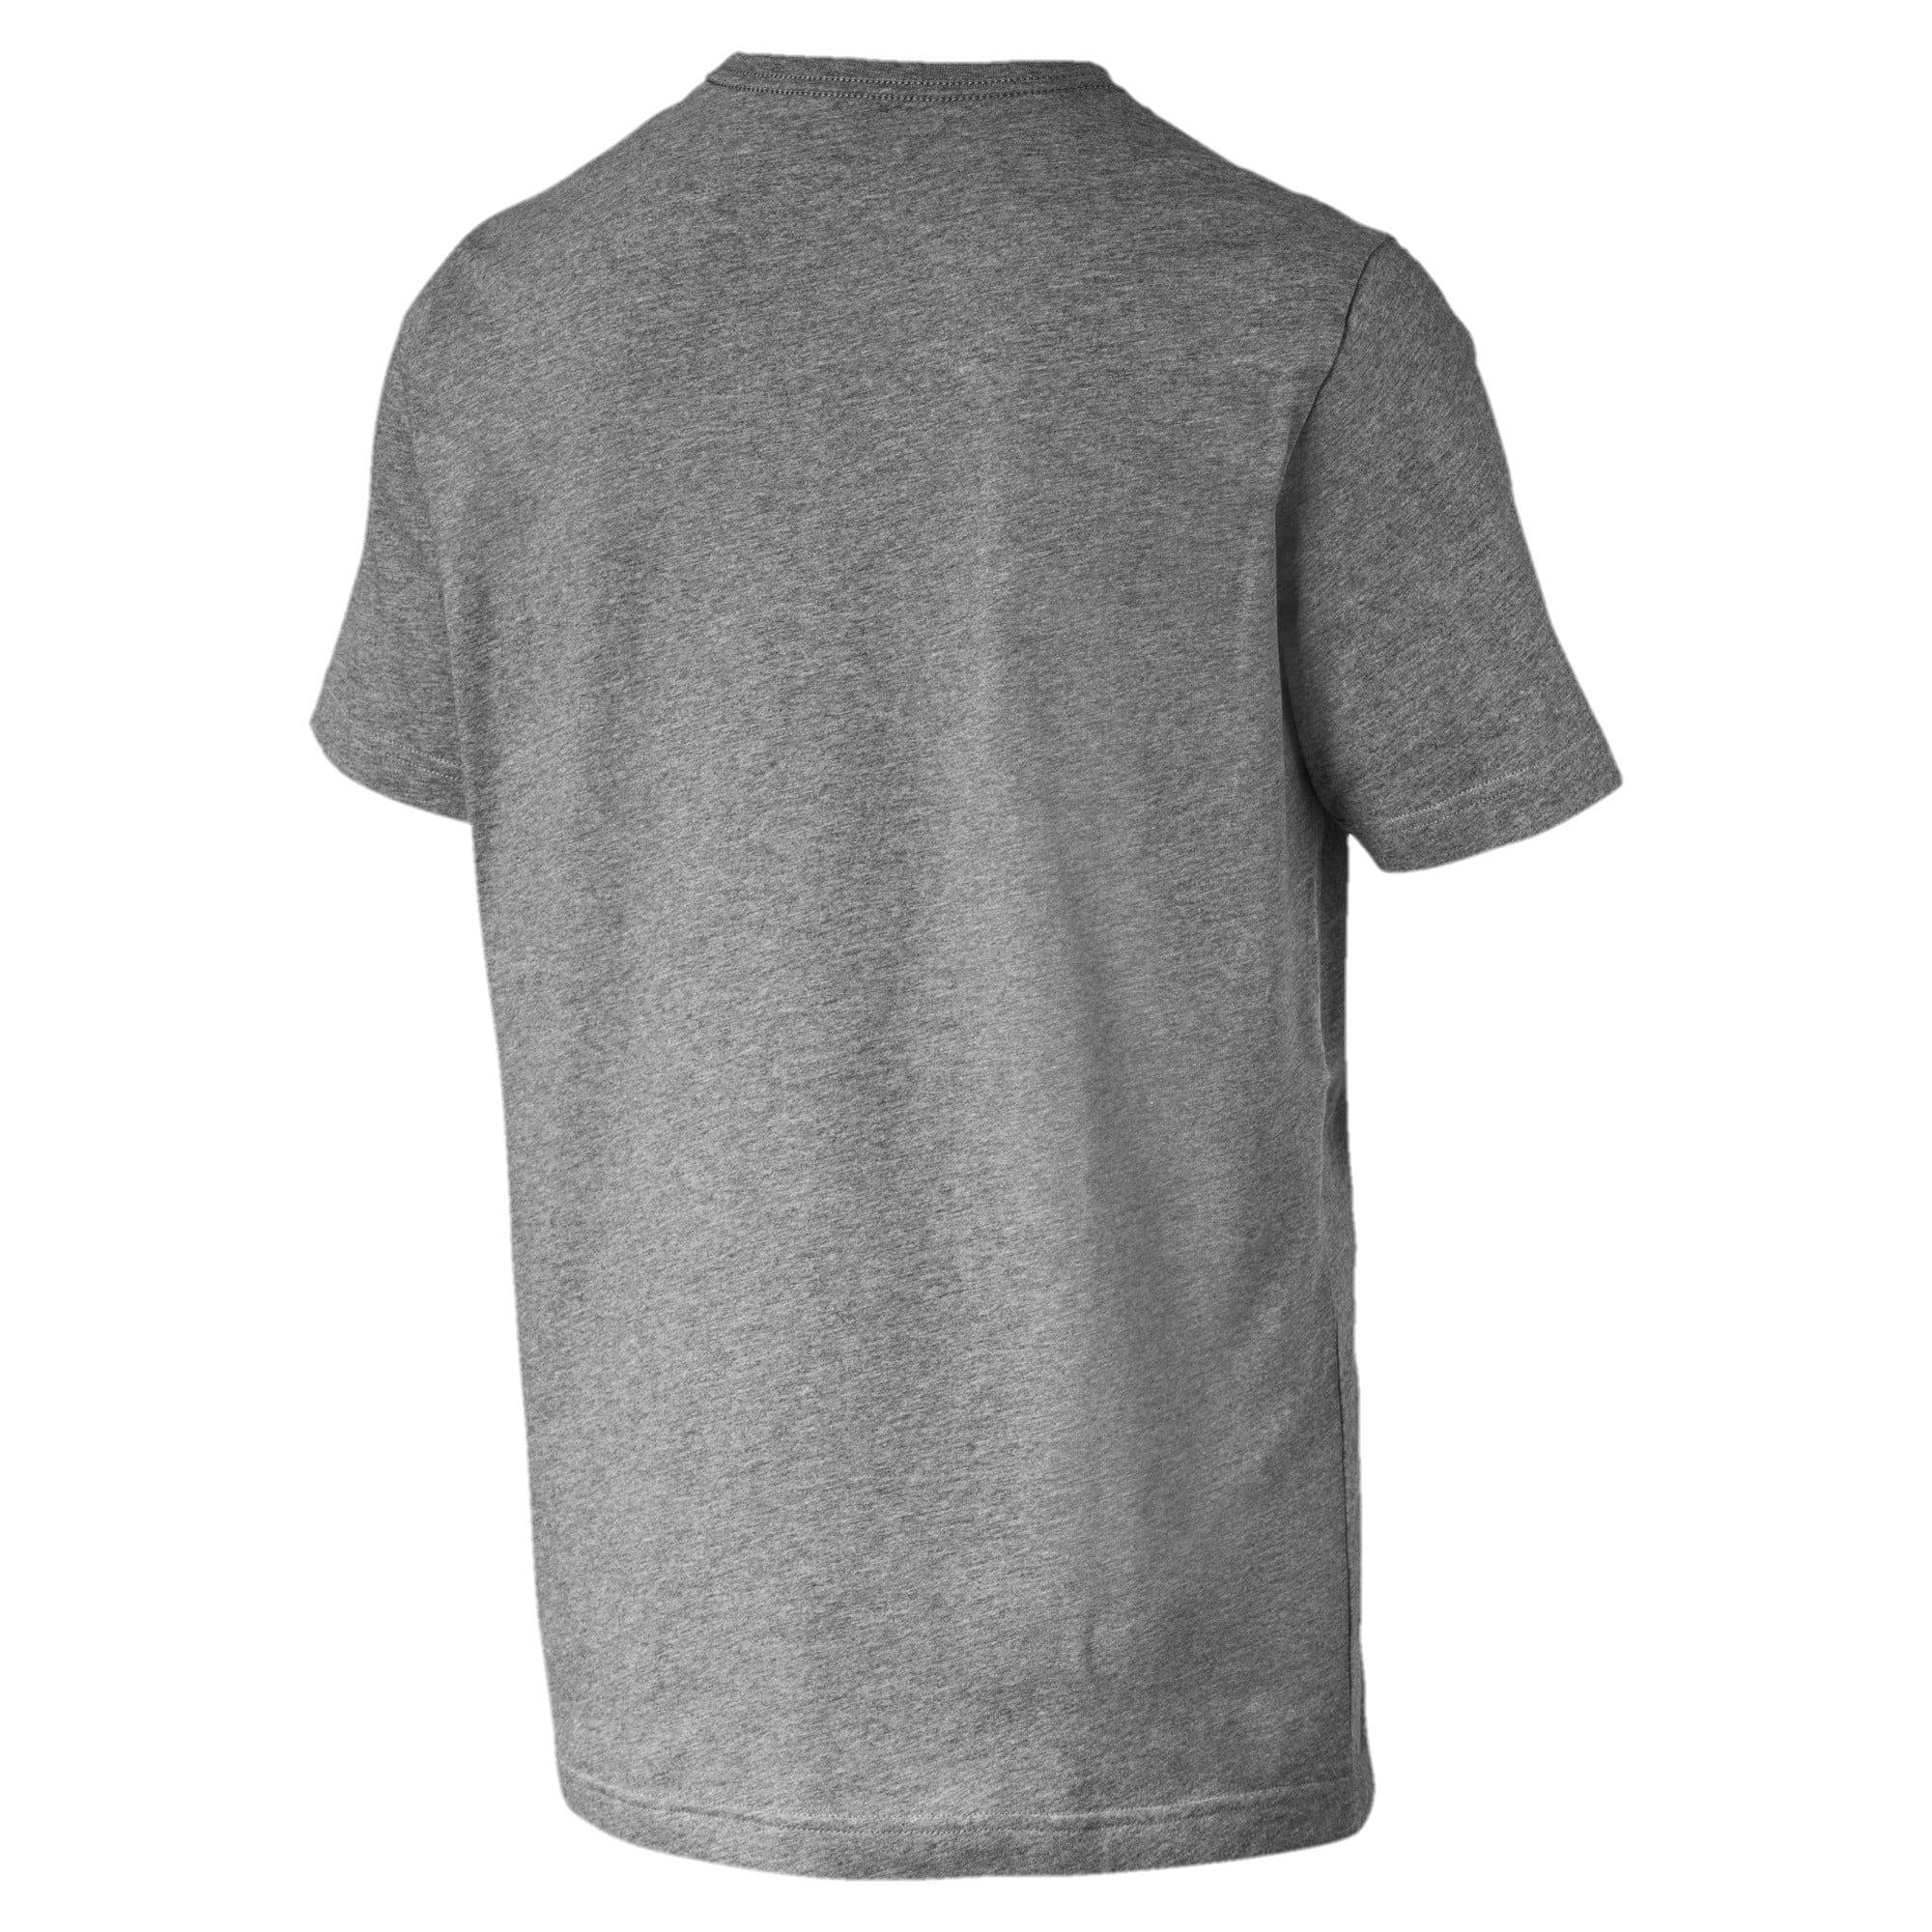 Thumbnail 5 of T-shirt con logo piccolo Essentials uomo, Medium Gray Heather-_Cat, medium